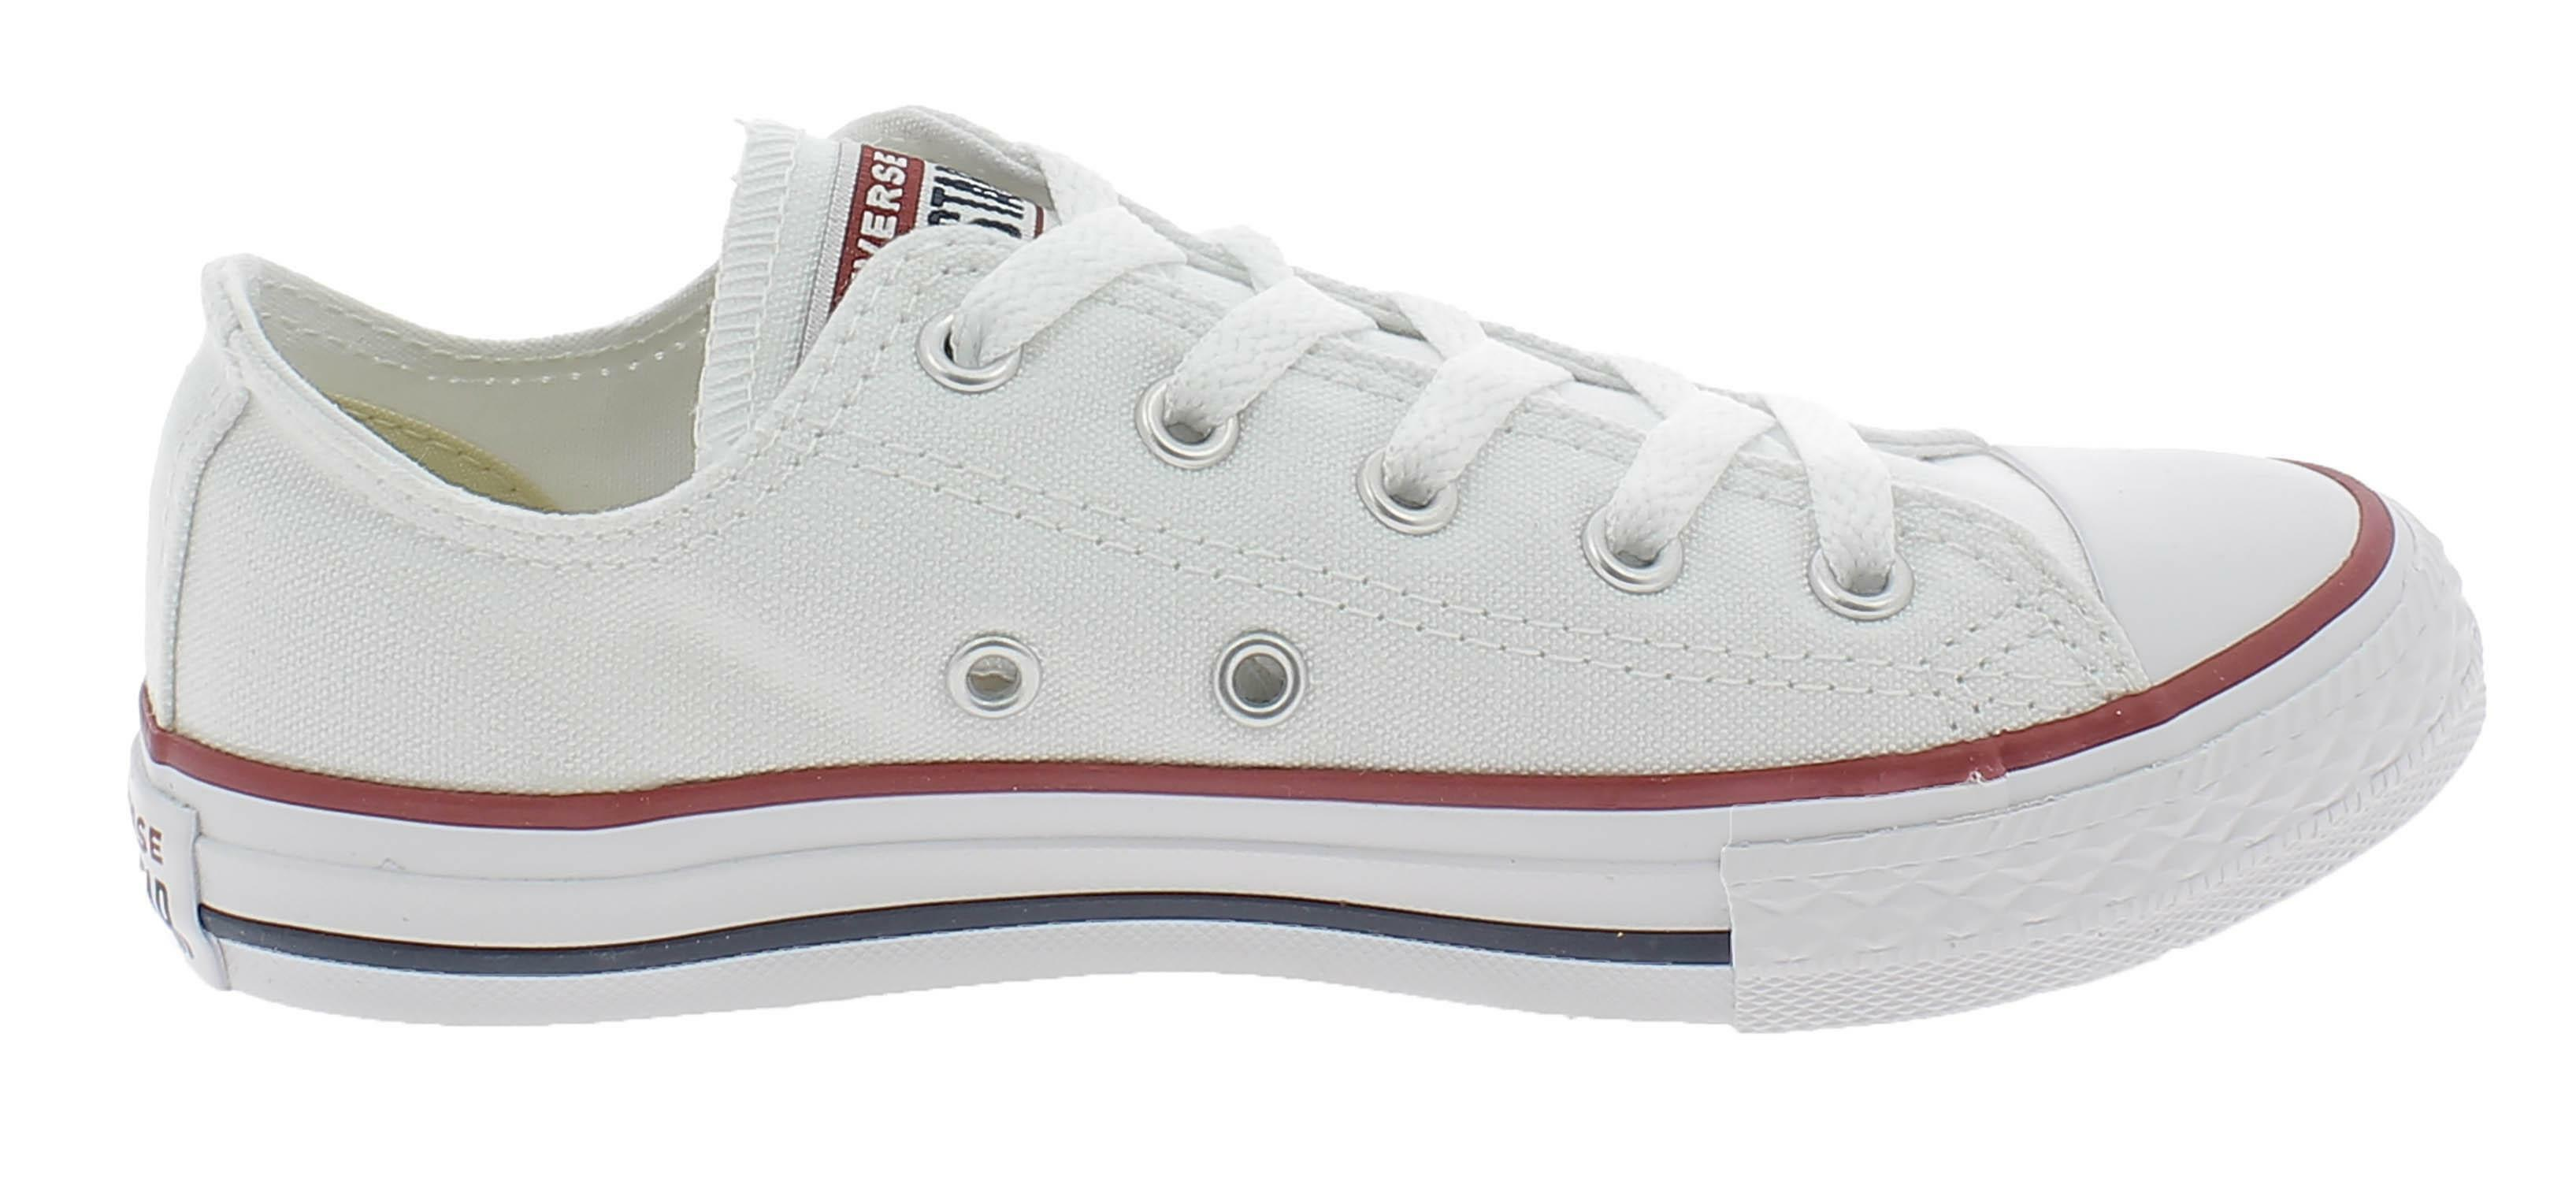 scarpe converse bambino bianche 25